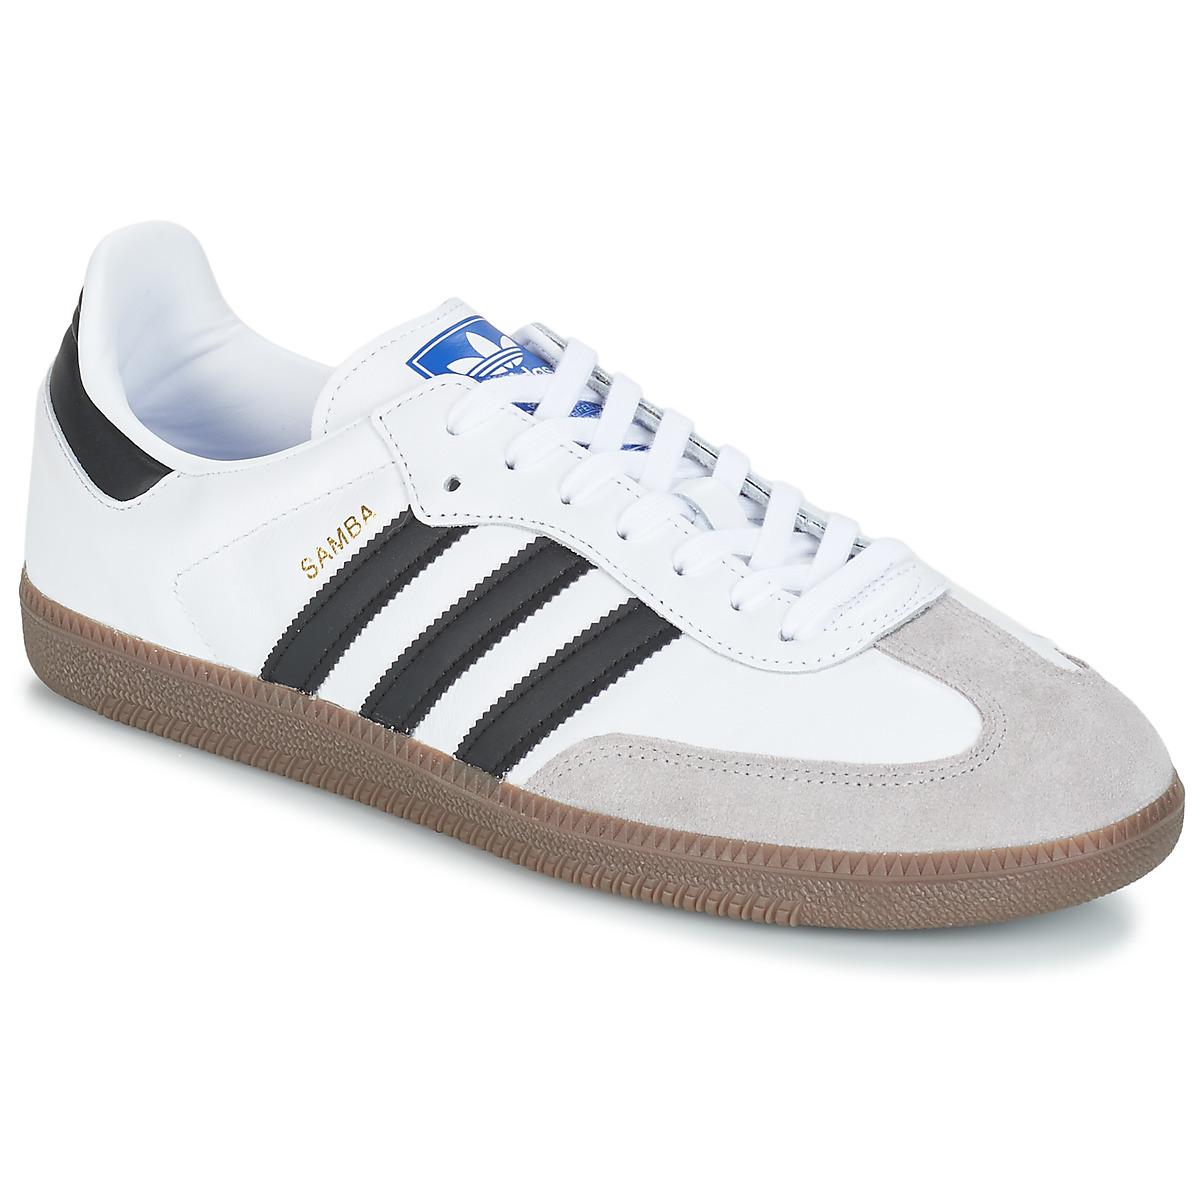 acquisti on line scarpe adidas samba